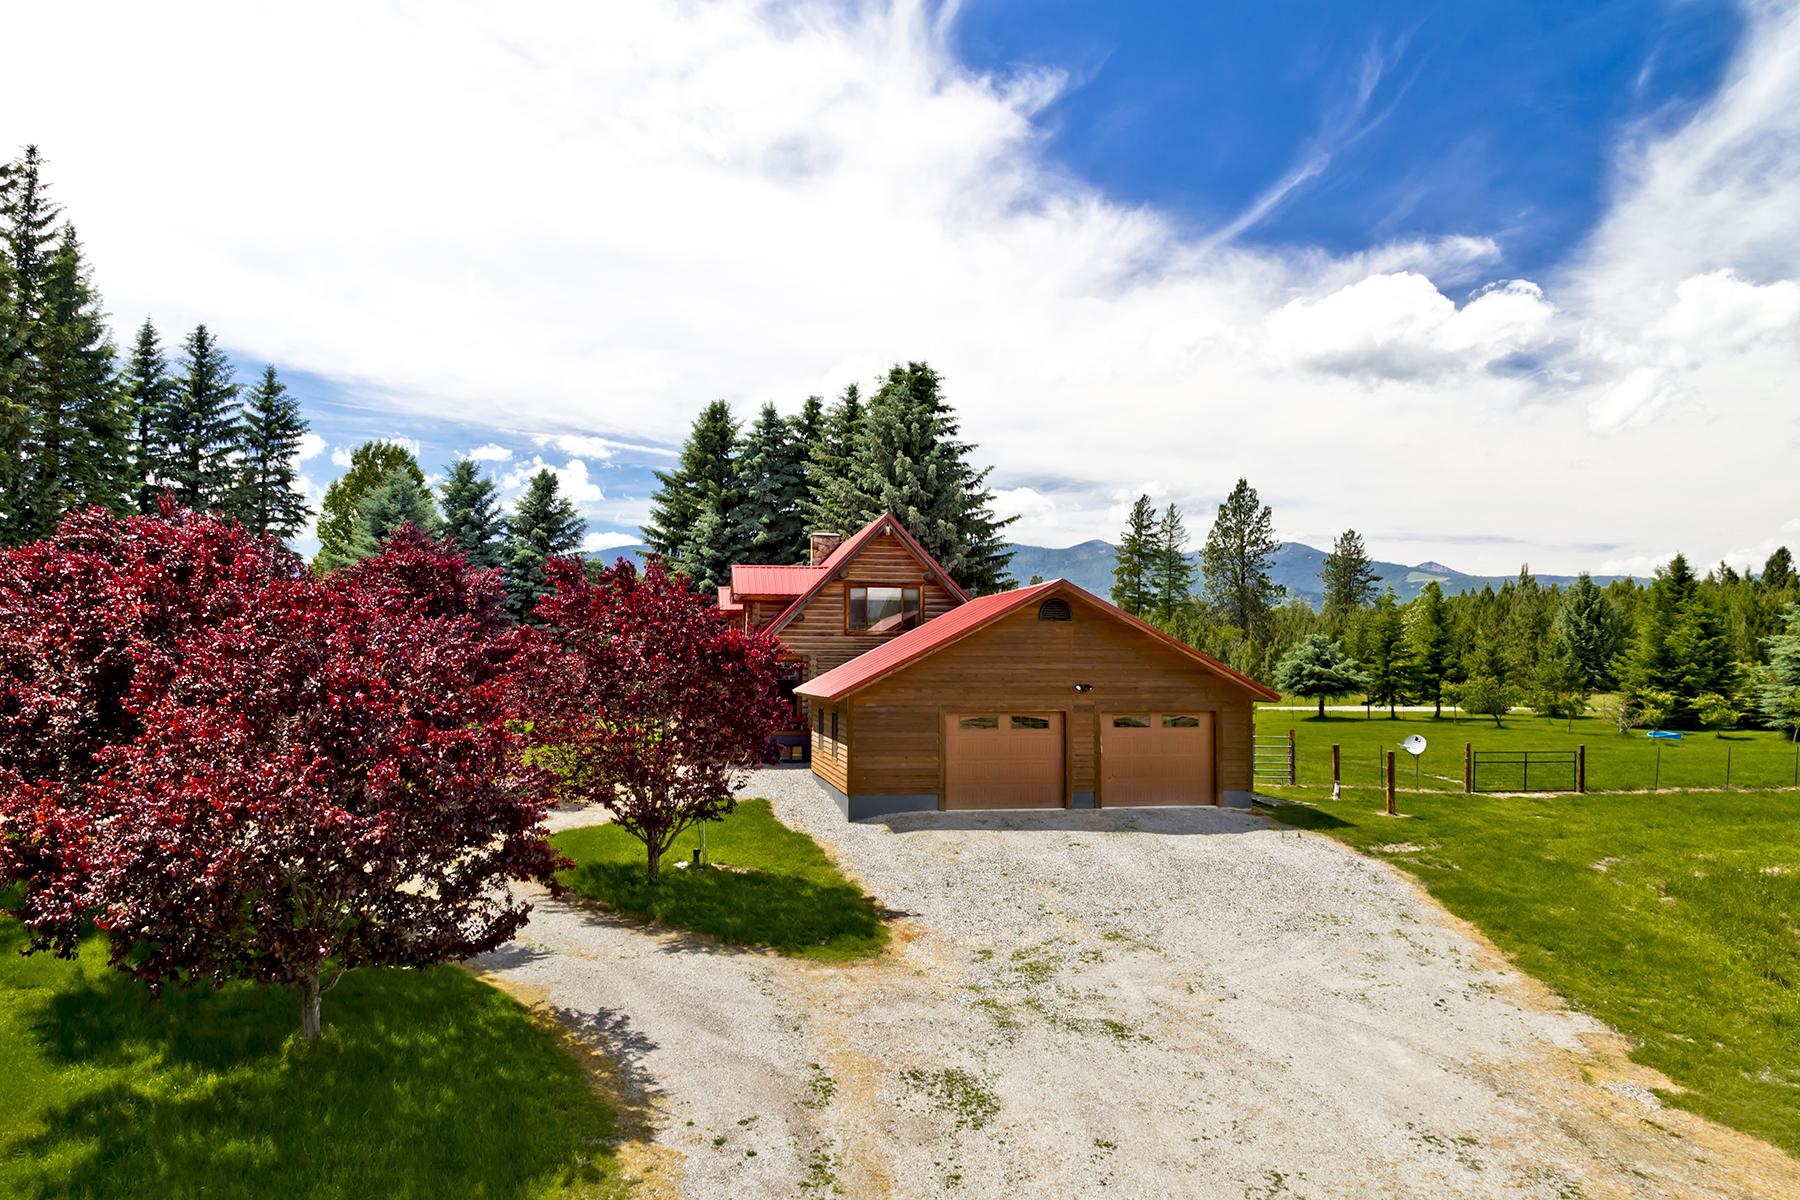 独户住宅 为 销售 在 Stunning 55 Acre Ranch in Selle Valley 3409 Selle Road 桑德波因特, 爱达荷州, 83864 美国